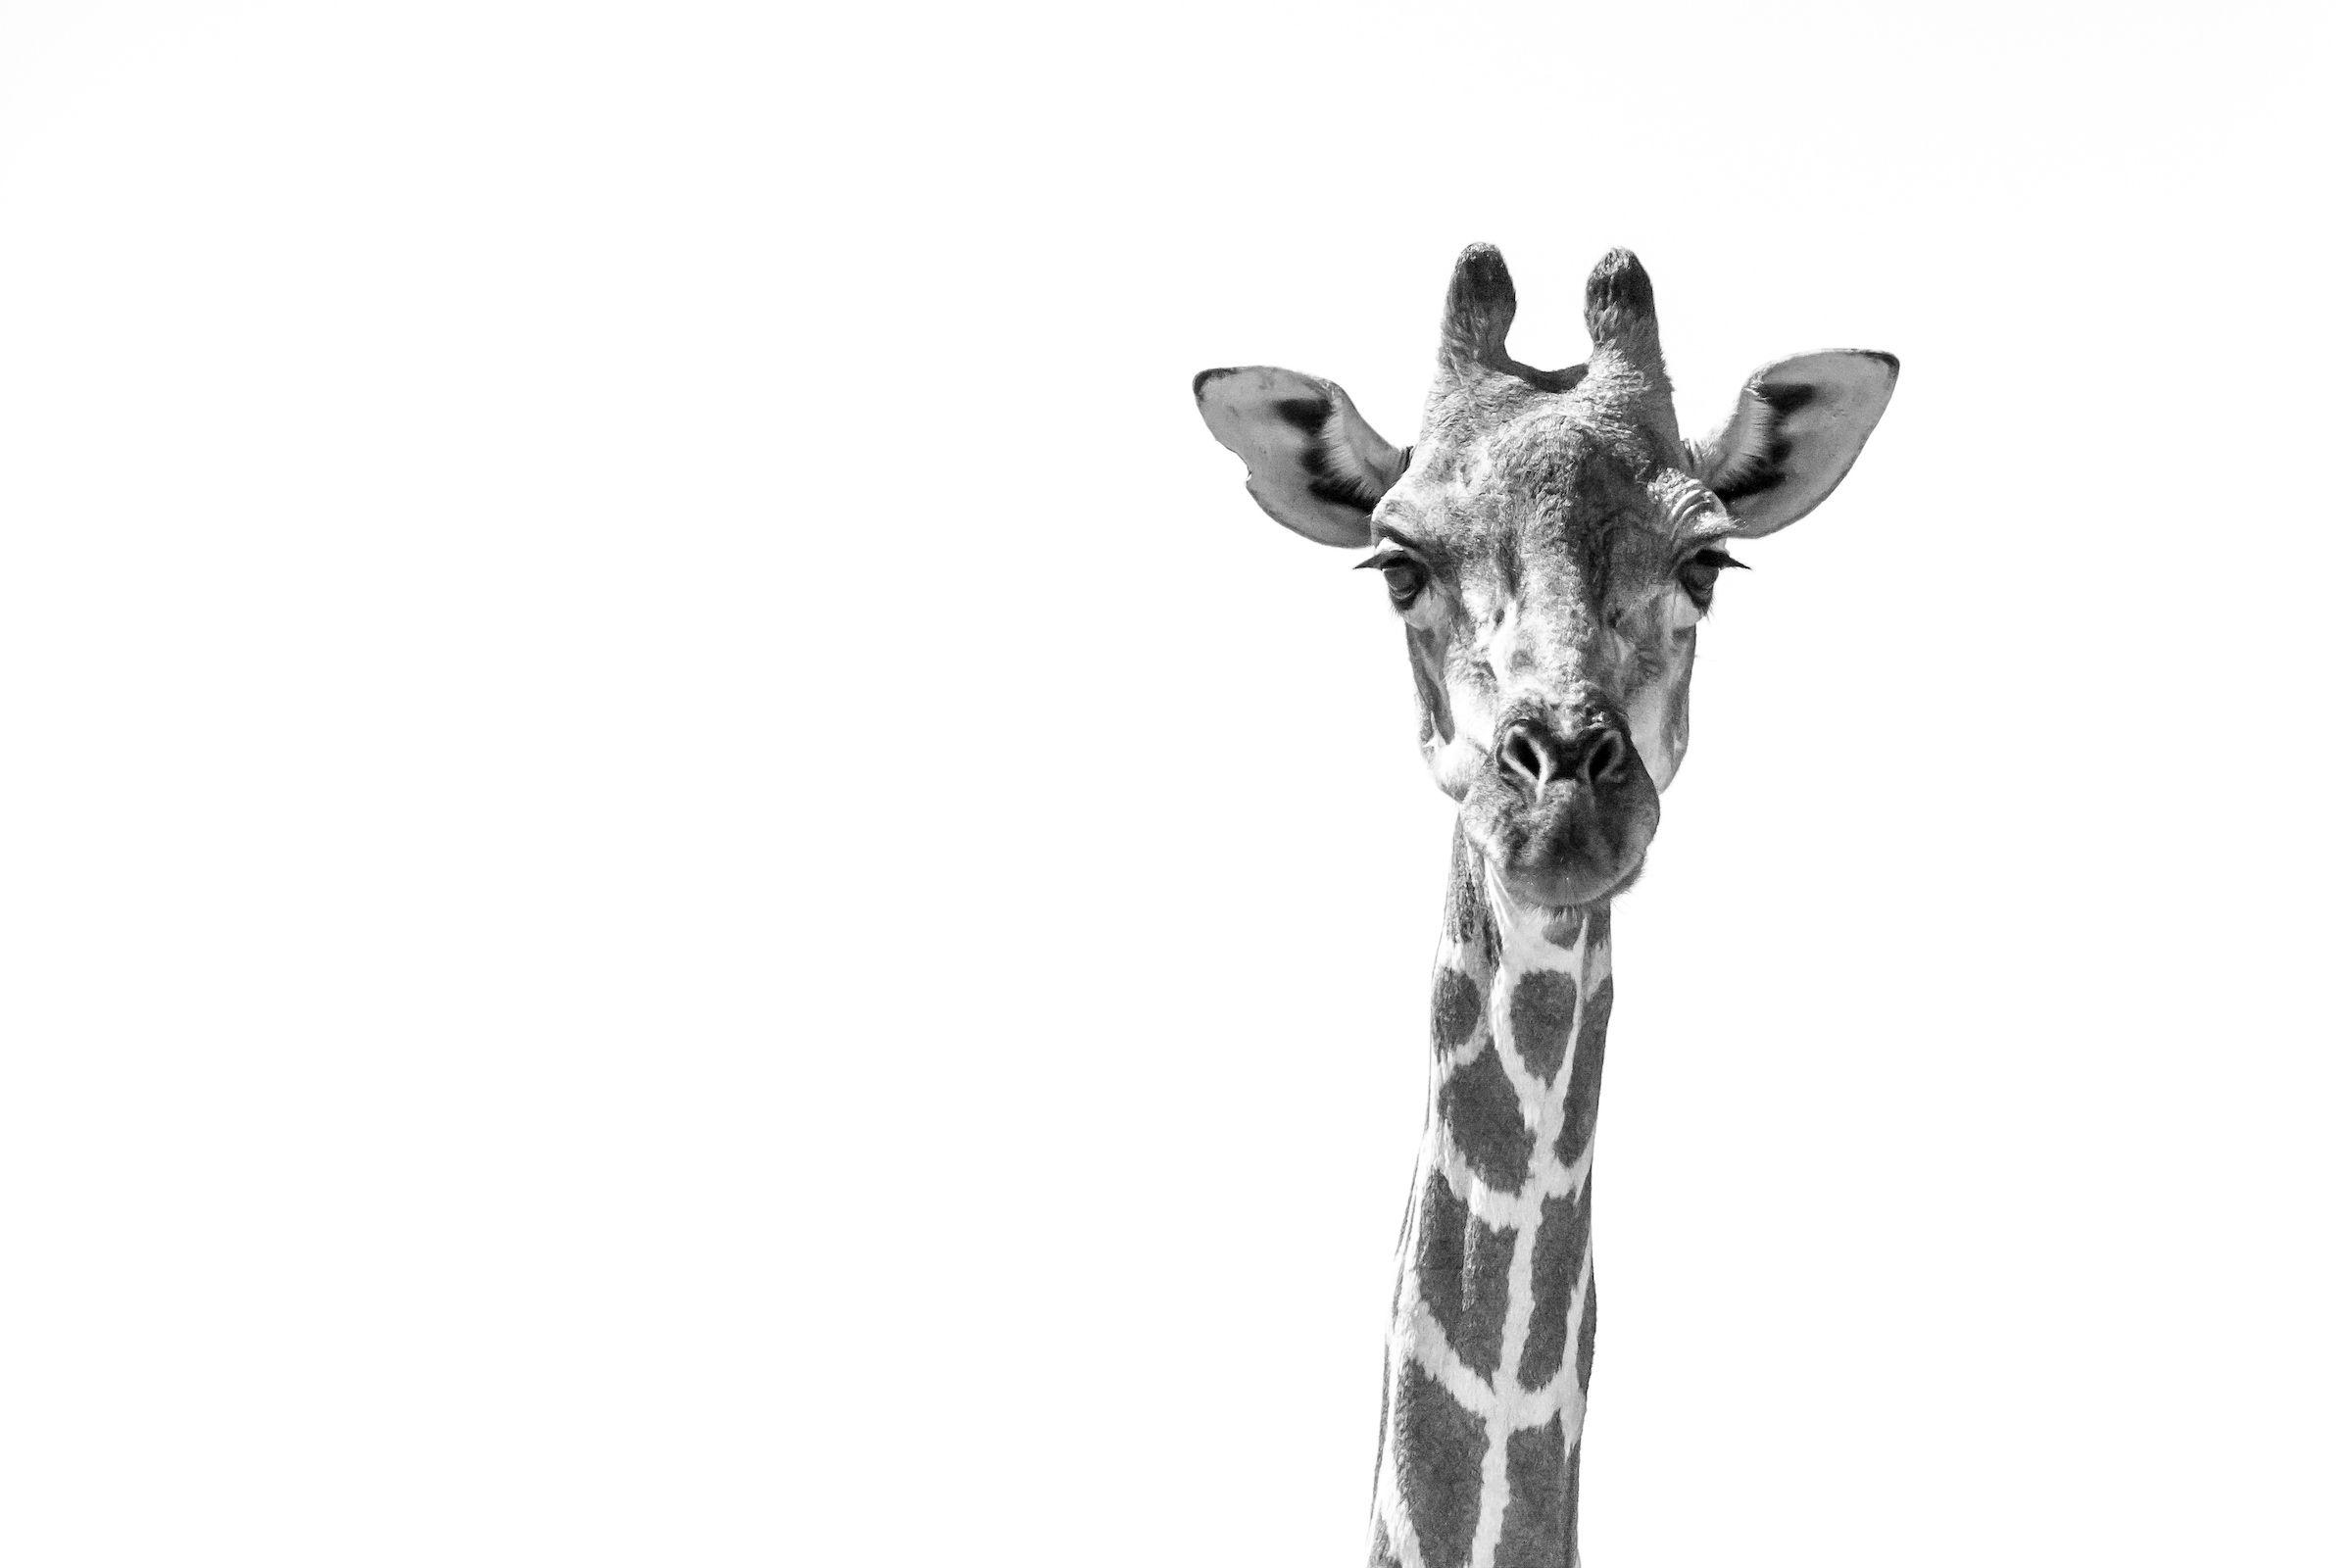 A giraffe portrait from Etosha